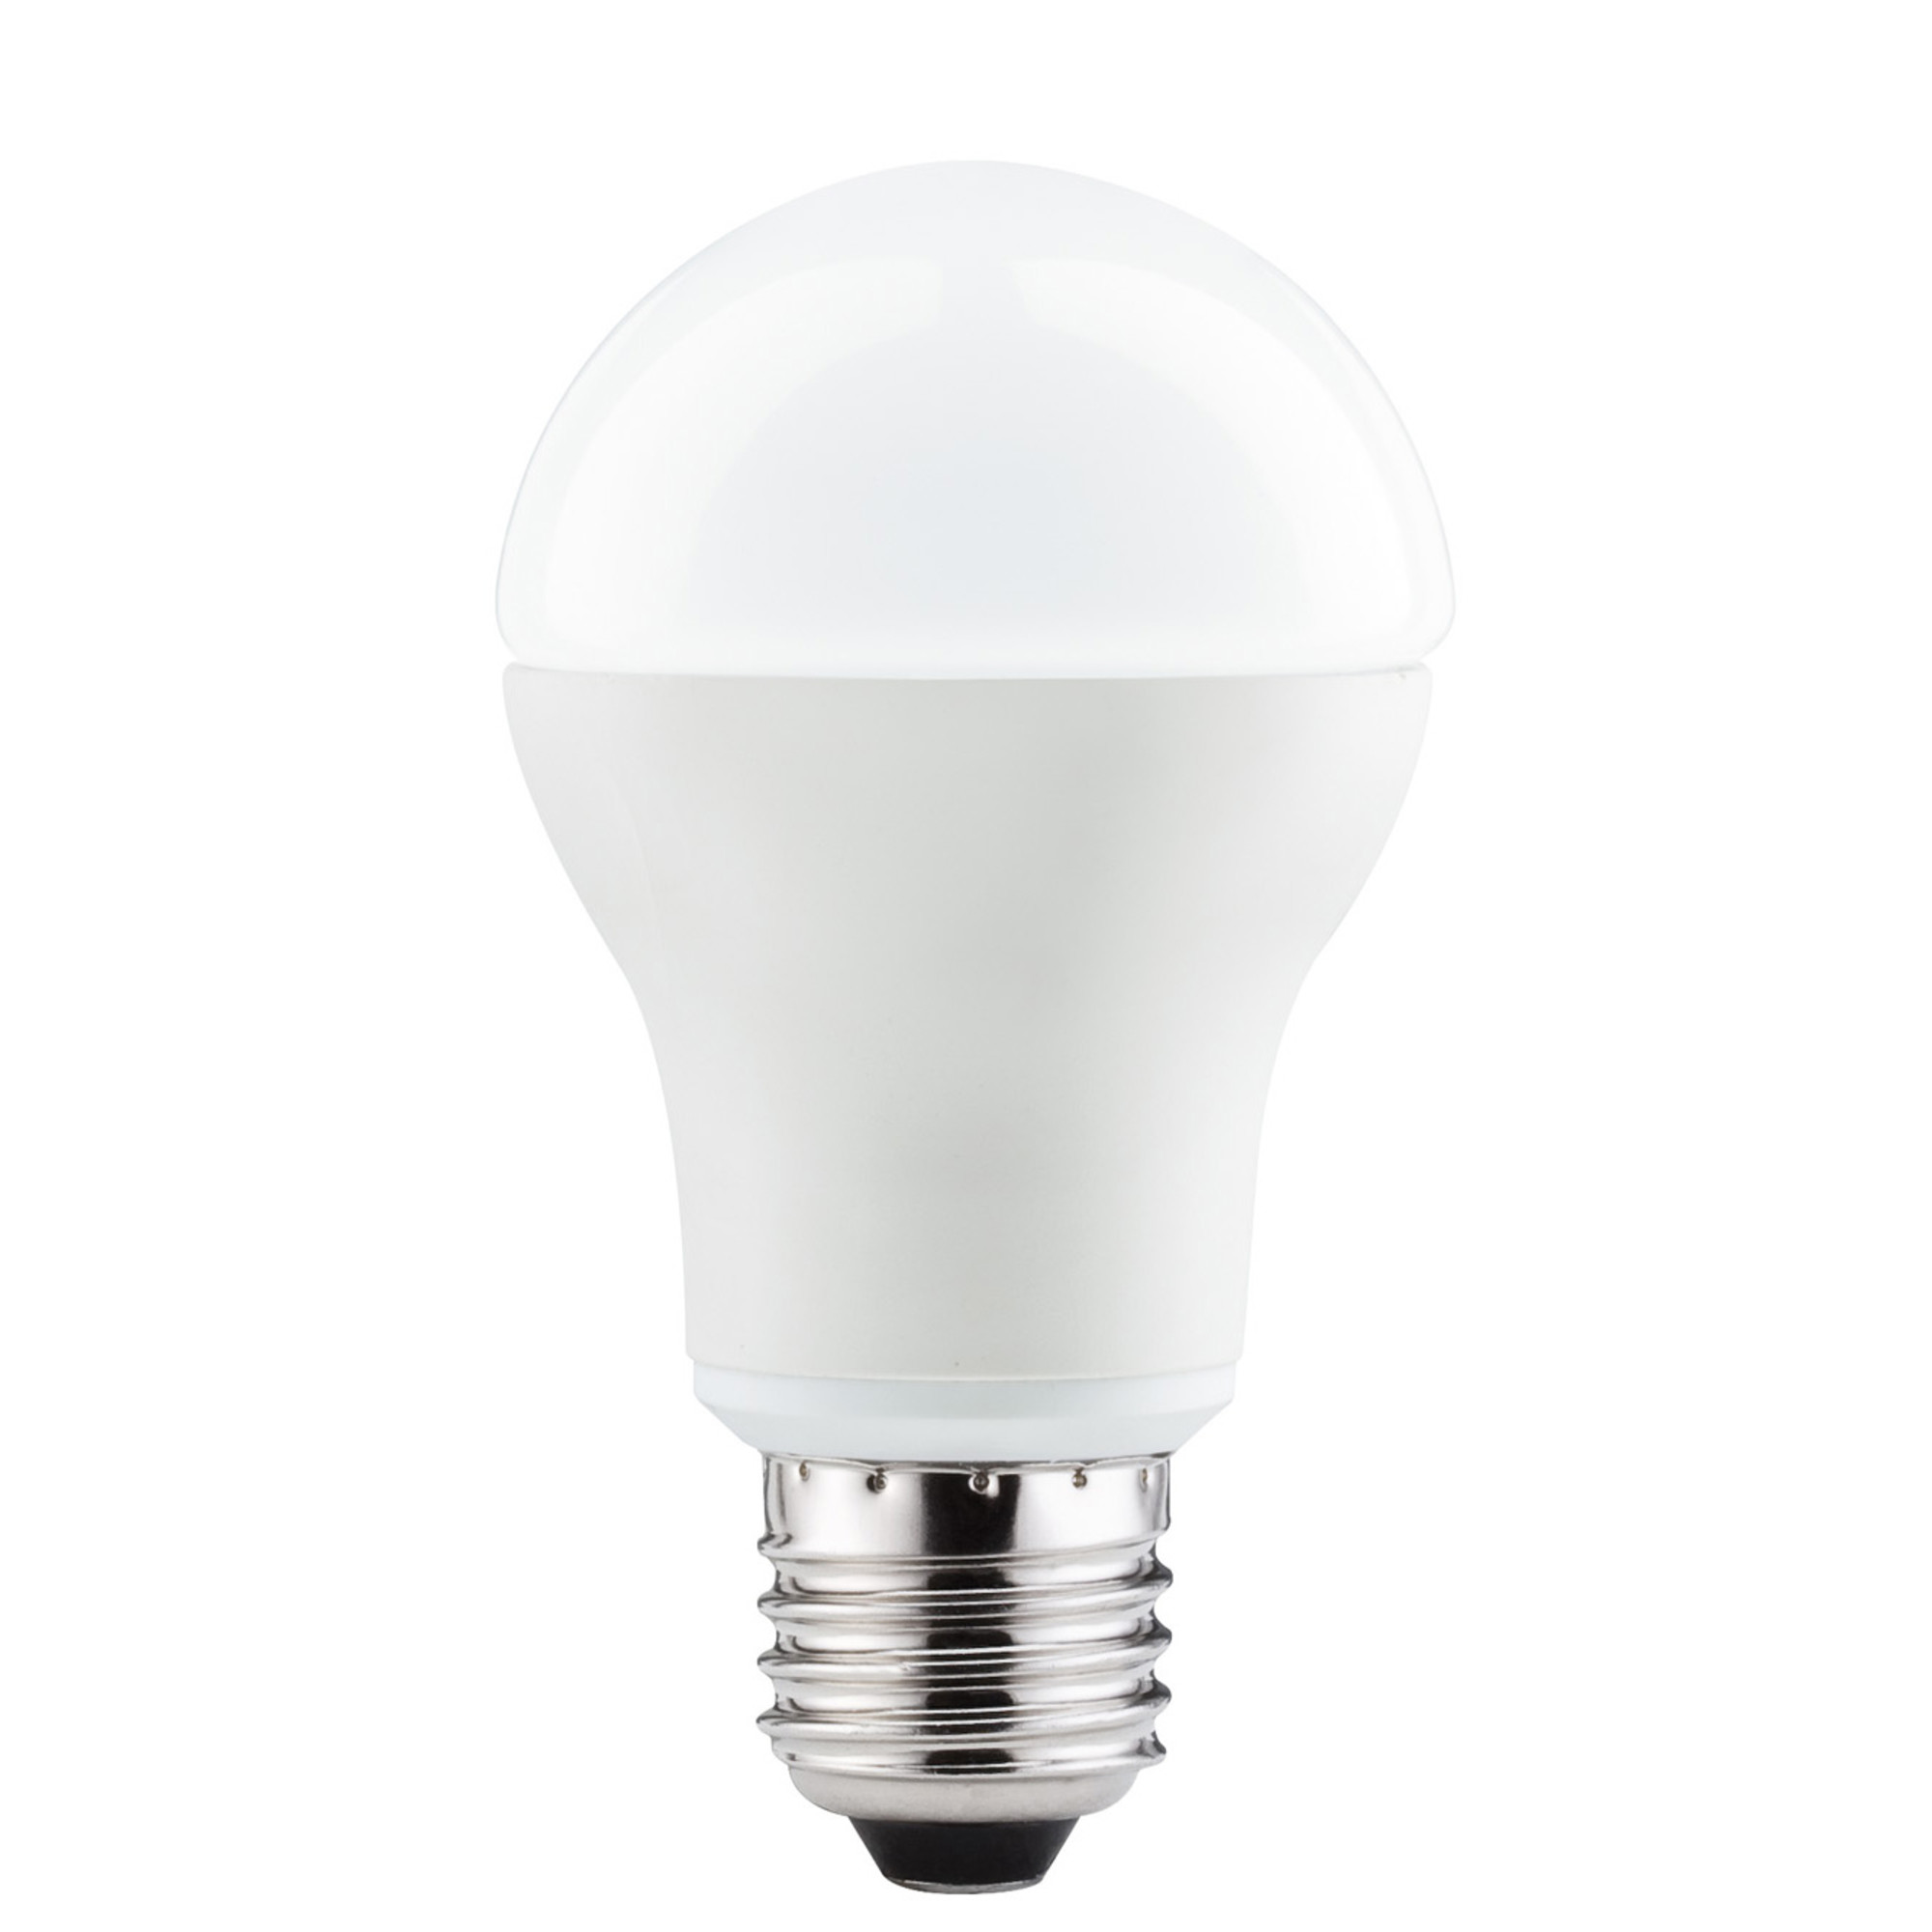 Лампа светодиодная Paulmann 28169 E27 806 Лм теплый свет